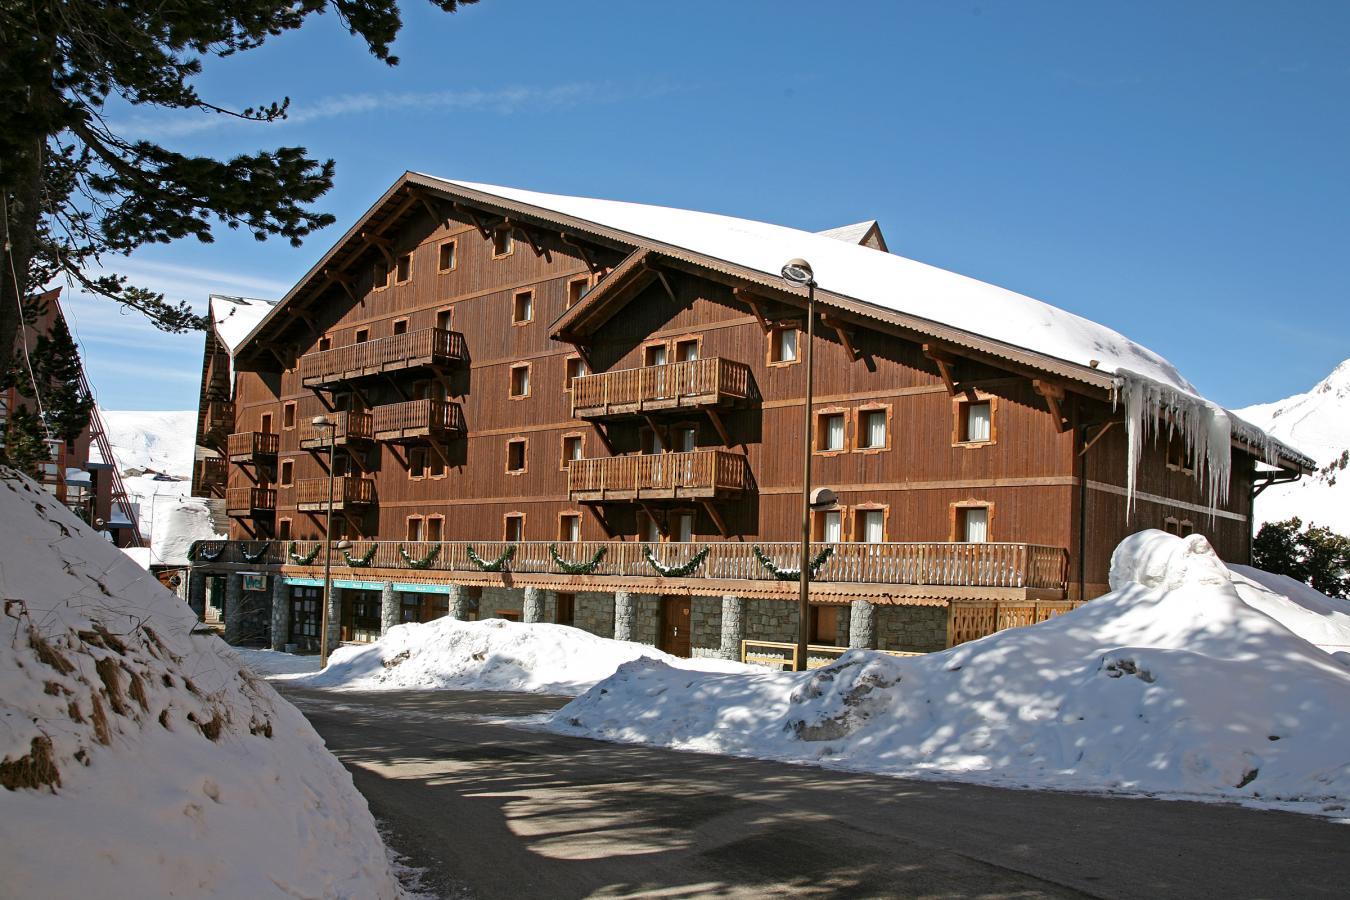 chalet altitude 20 les arcs location vacances ski les arcs ski planet